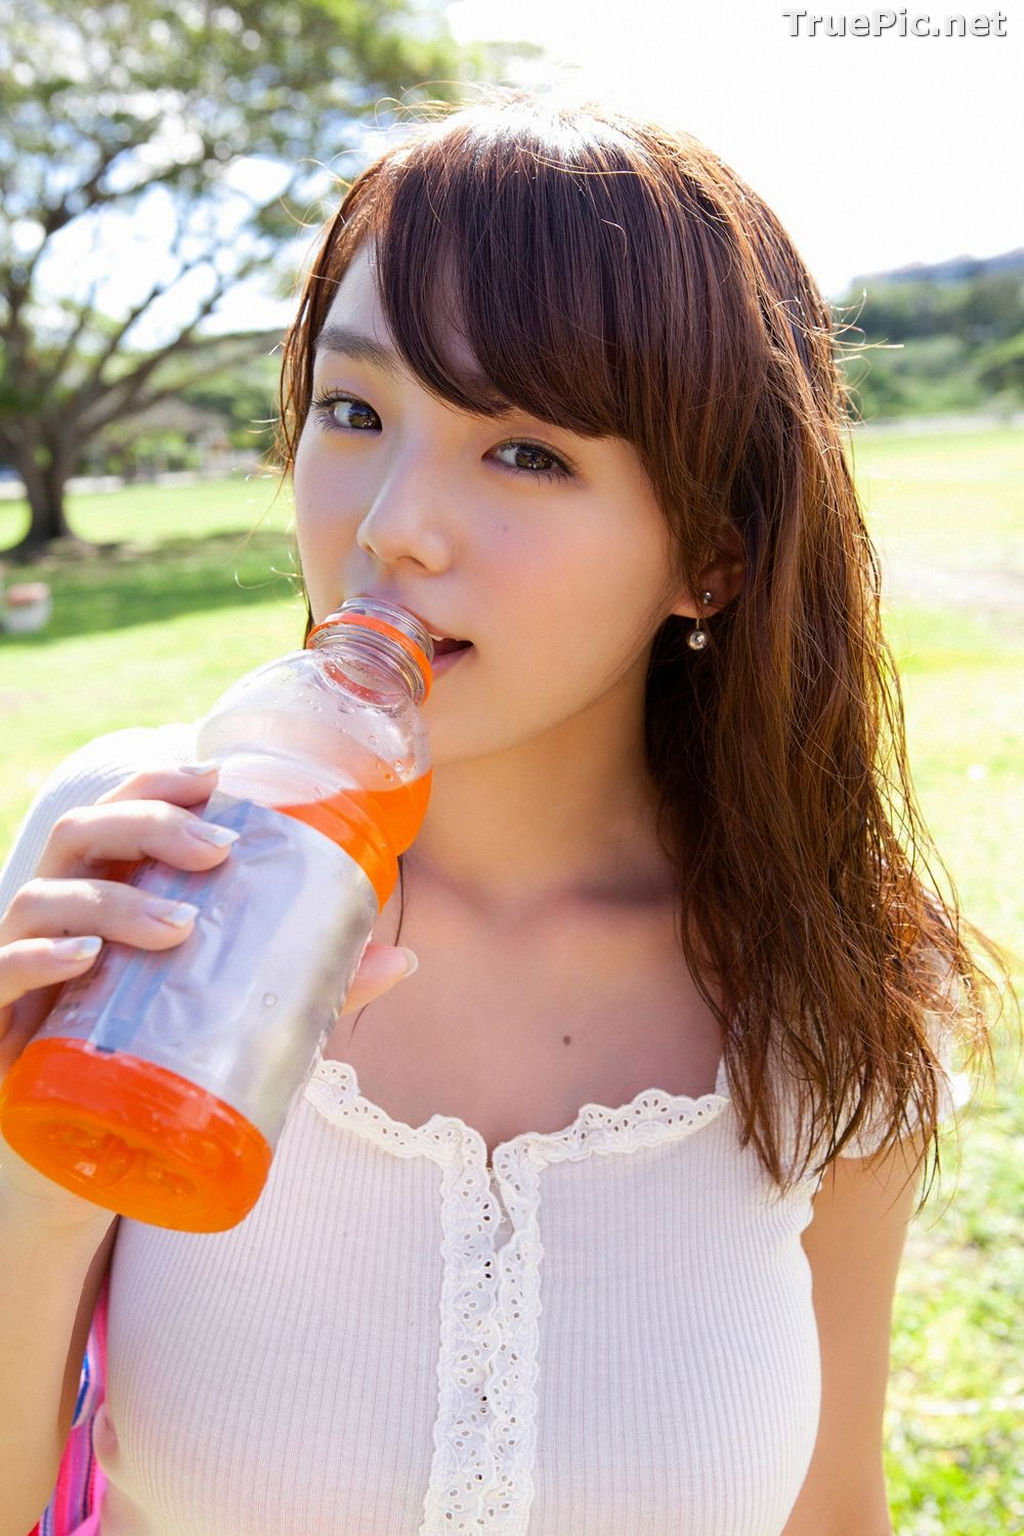 Image [YS Web] Vol.465 – Japanese Model Ai Shinozaki – Mermaid of Love Photo Album - TruePic.net - Picture-8